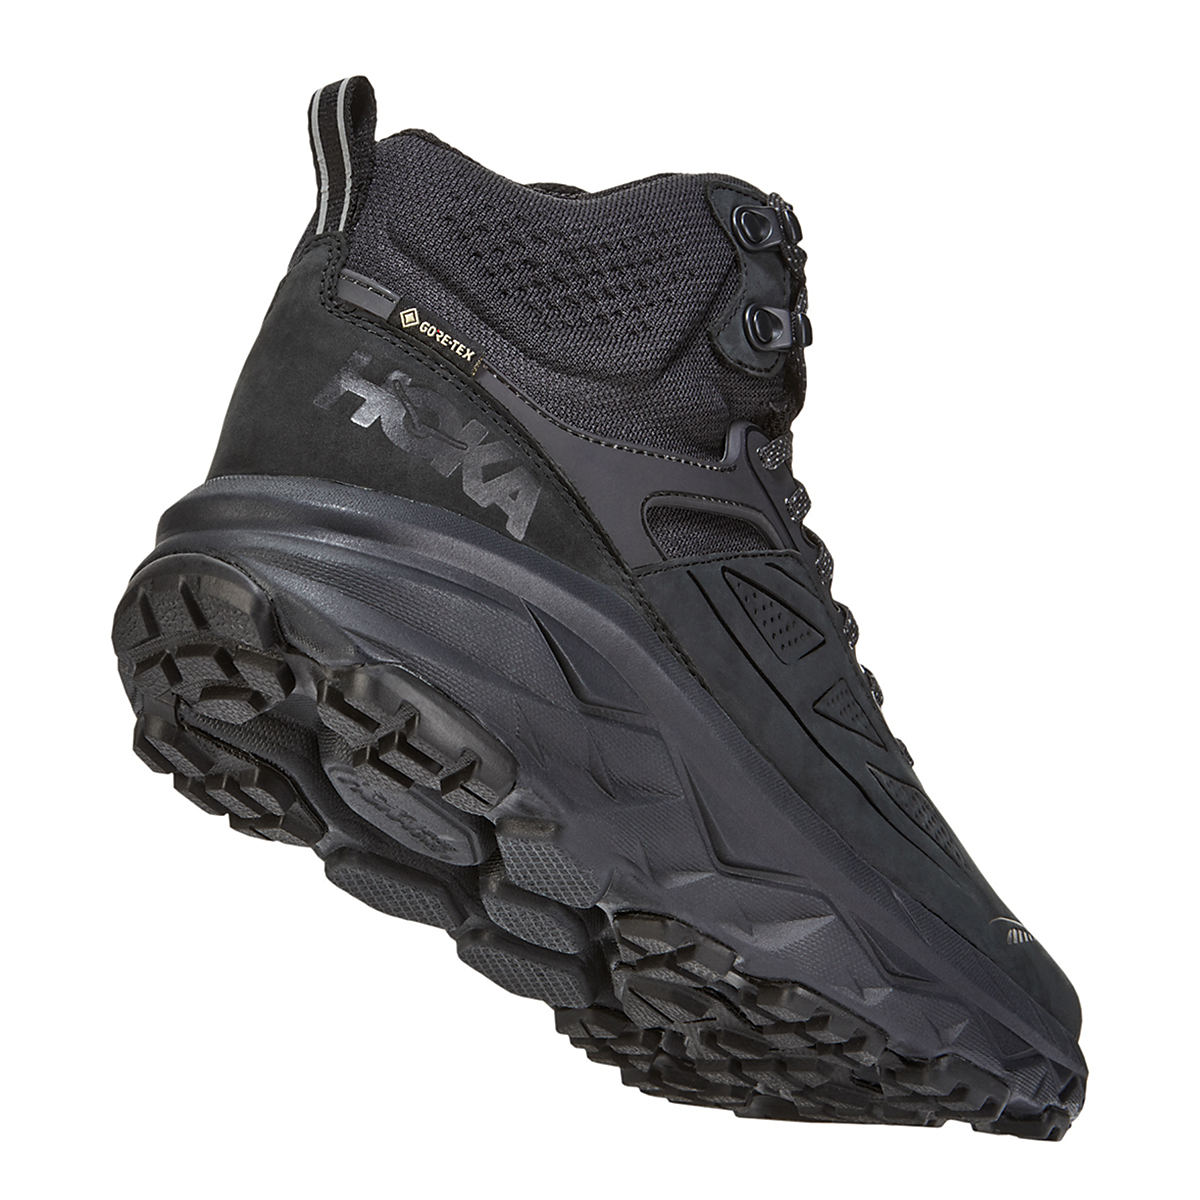 Men's Hoka One One Challenger Mid Gore-Tex Trail Running Shoe - Color: Black (Regular Width) - Size: 11, Black, large, image 3